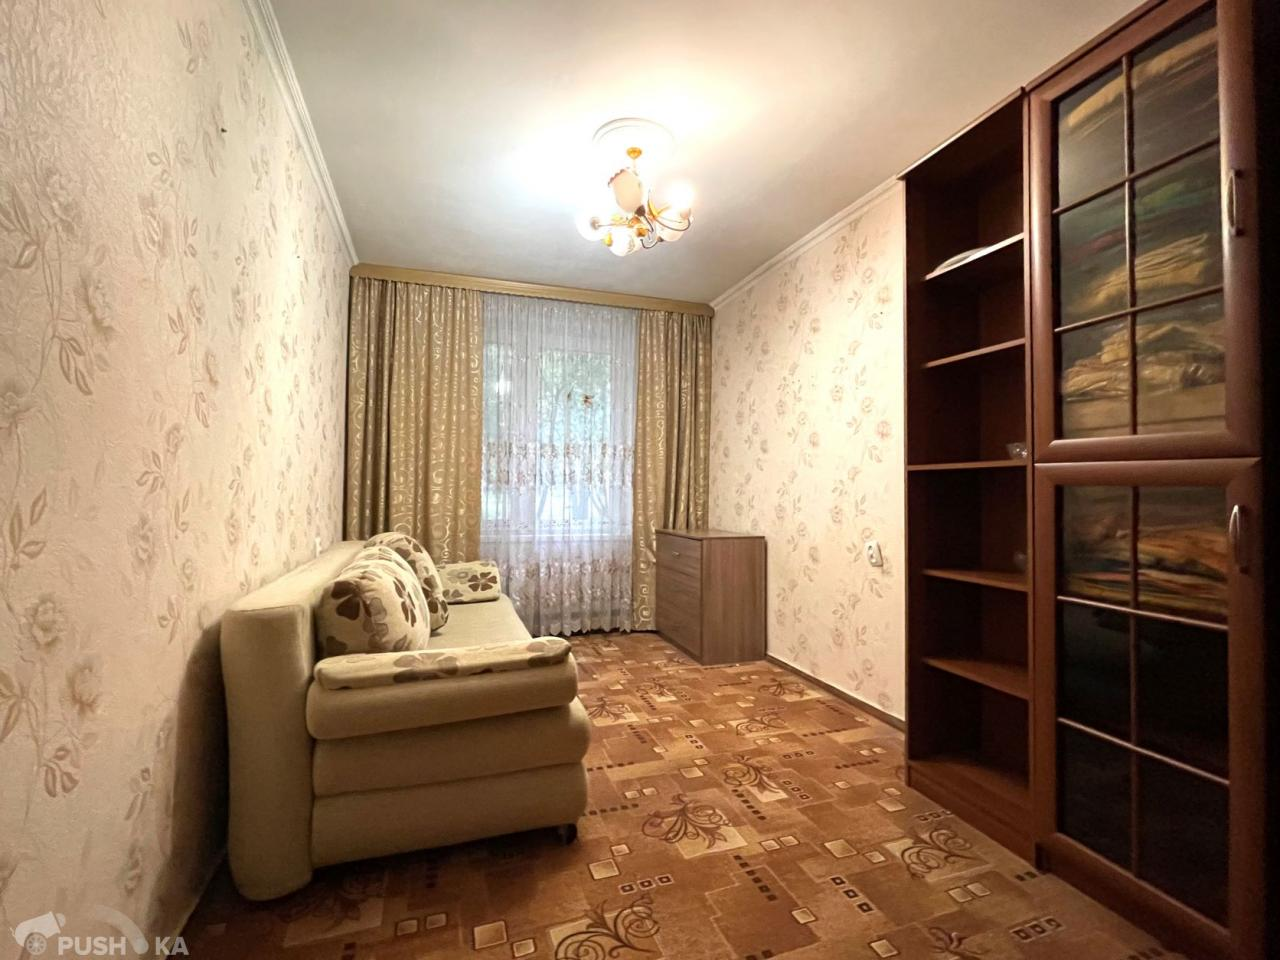 Продаётся 3-комнатная квартира 57.0 кв.м. этаж 1/7 за 9 800 000 руб